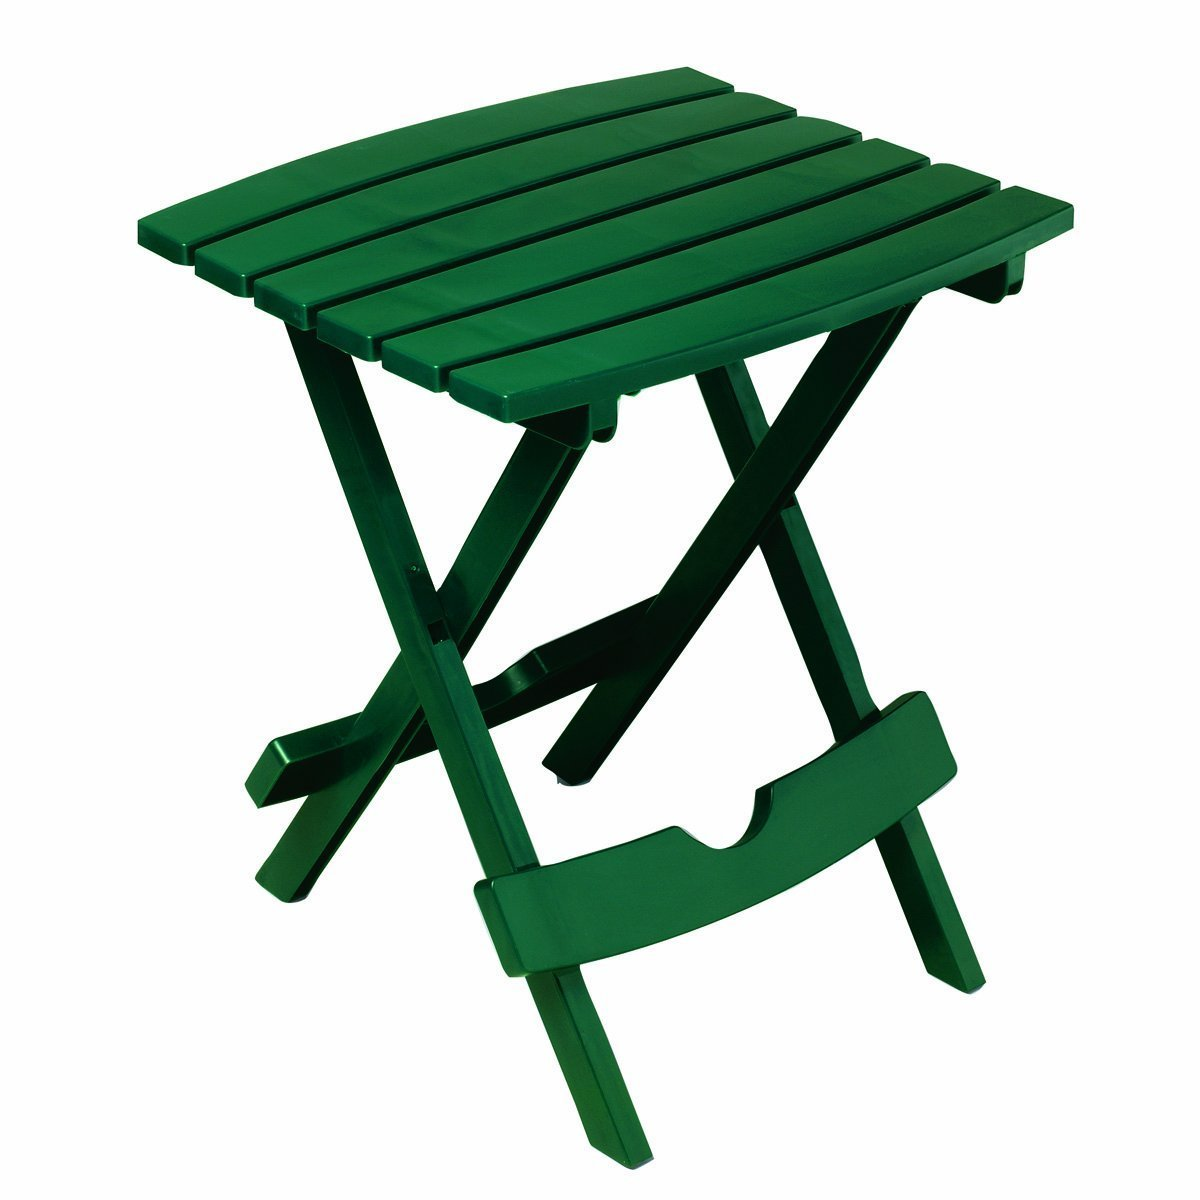 Perfect Amazon.com : Adams Manufacturing 8500 16 3700 Plastic Quik Fold Side Table,  Hunter Green : Patio Side Tables : Garden U0026 Outdoor